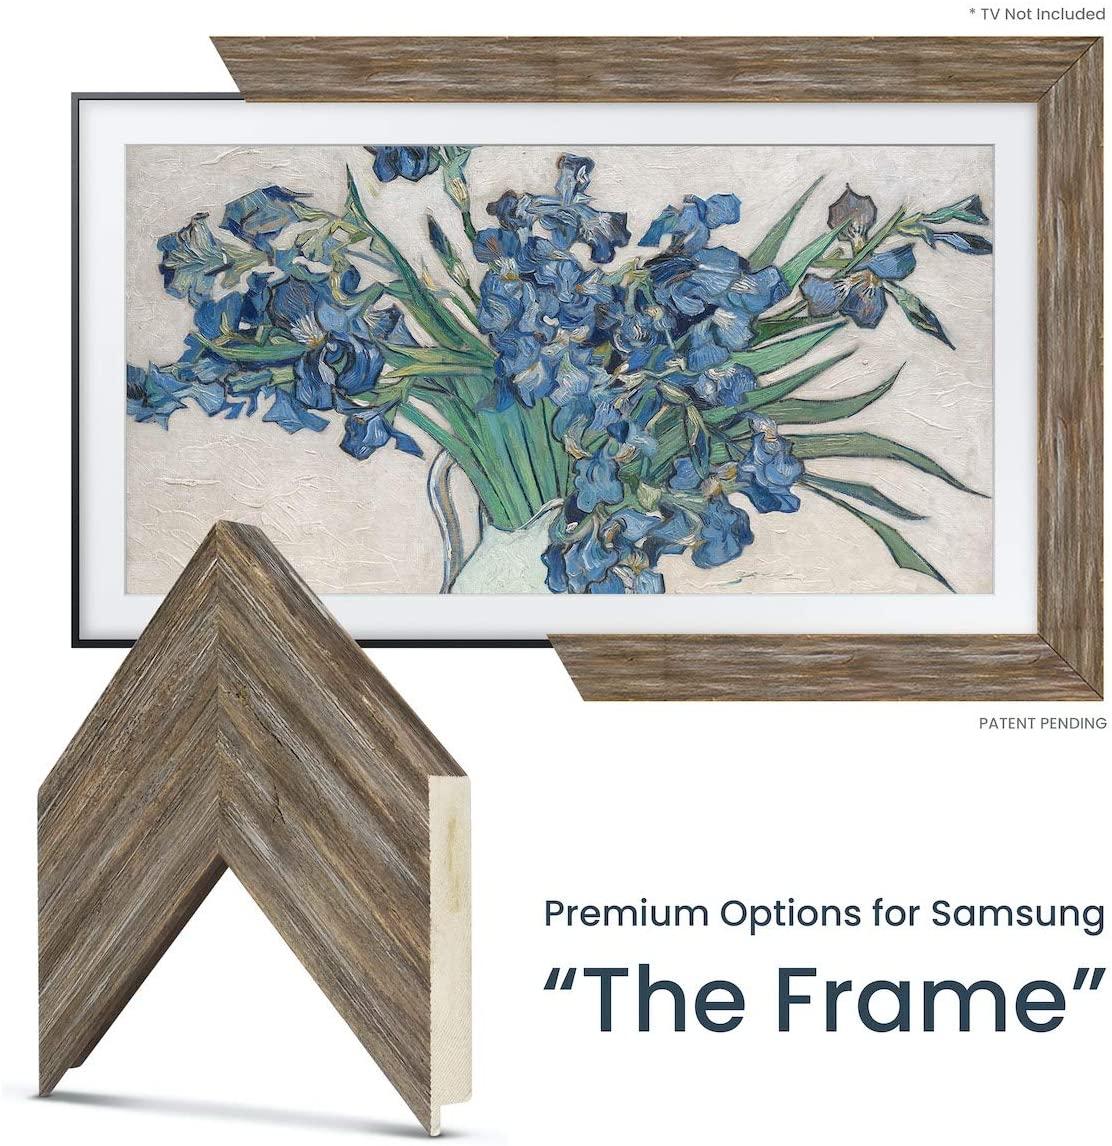 Deco TV Frames - Distressed Barnwood Frame Custom for Samsung The Frame TV(55